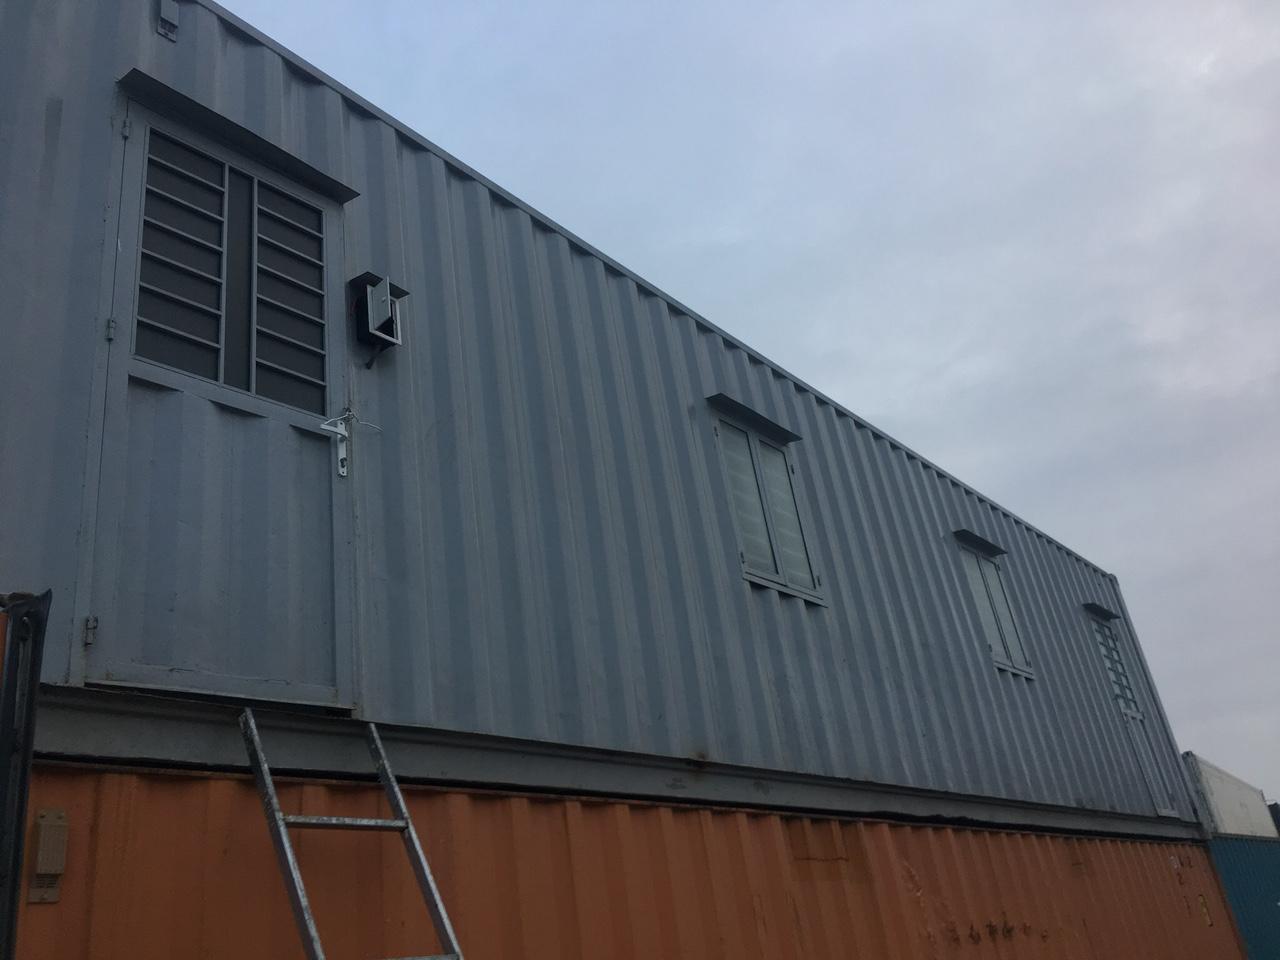 Container văn phòng 40 feet đẹp